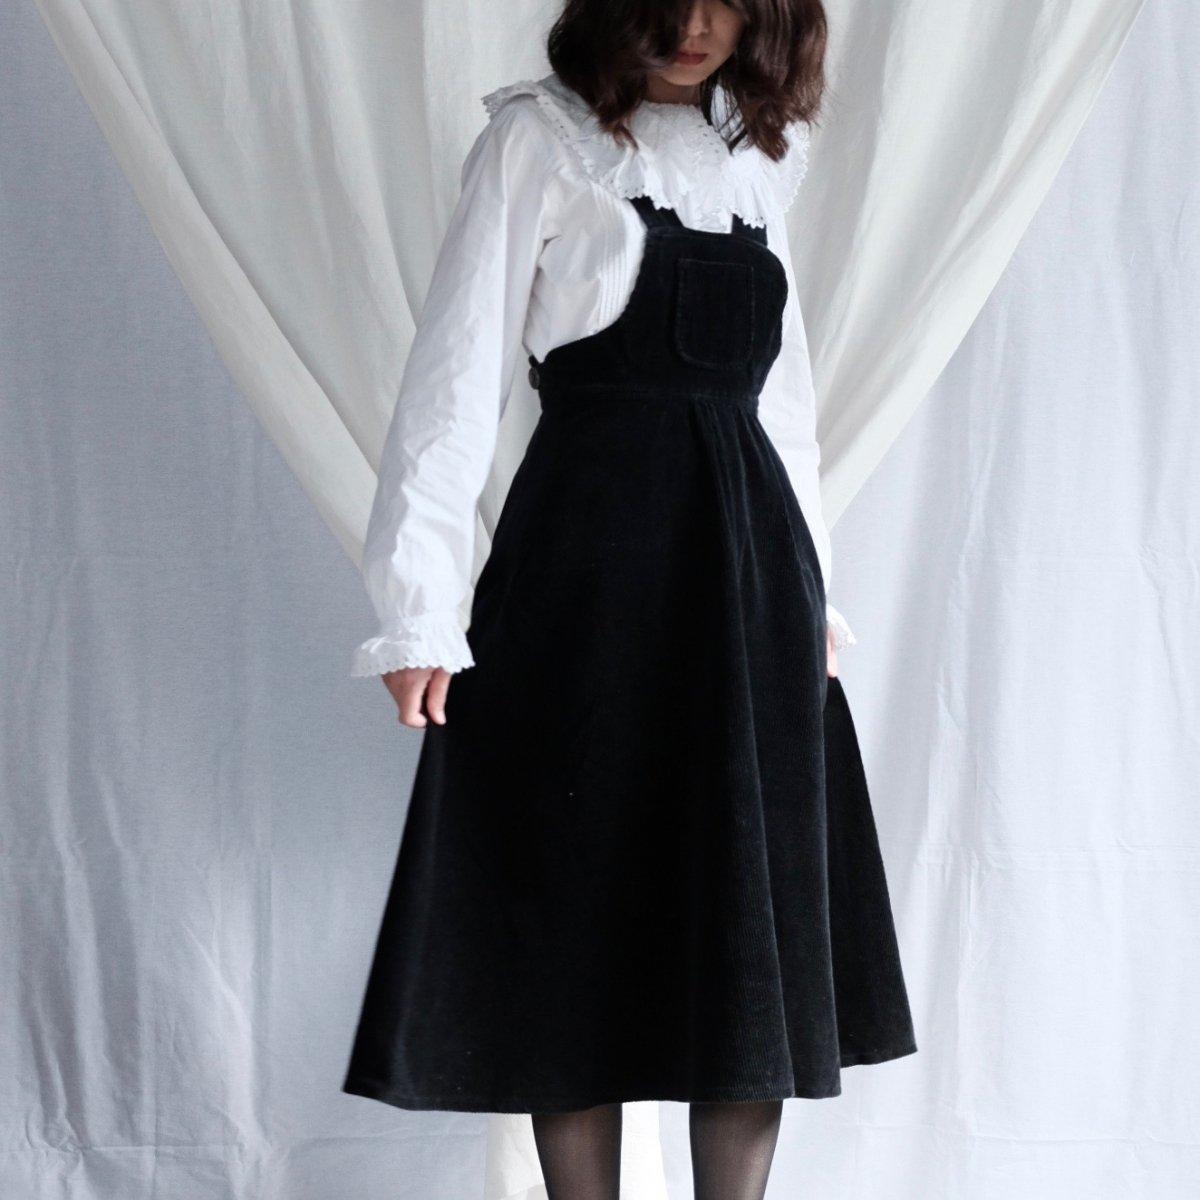 [VINTAGE] Little Black Pinafore Dress